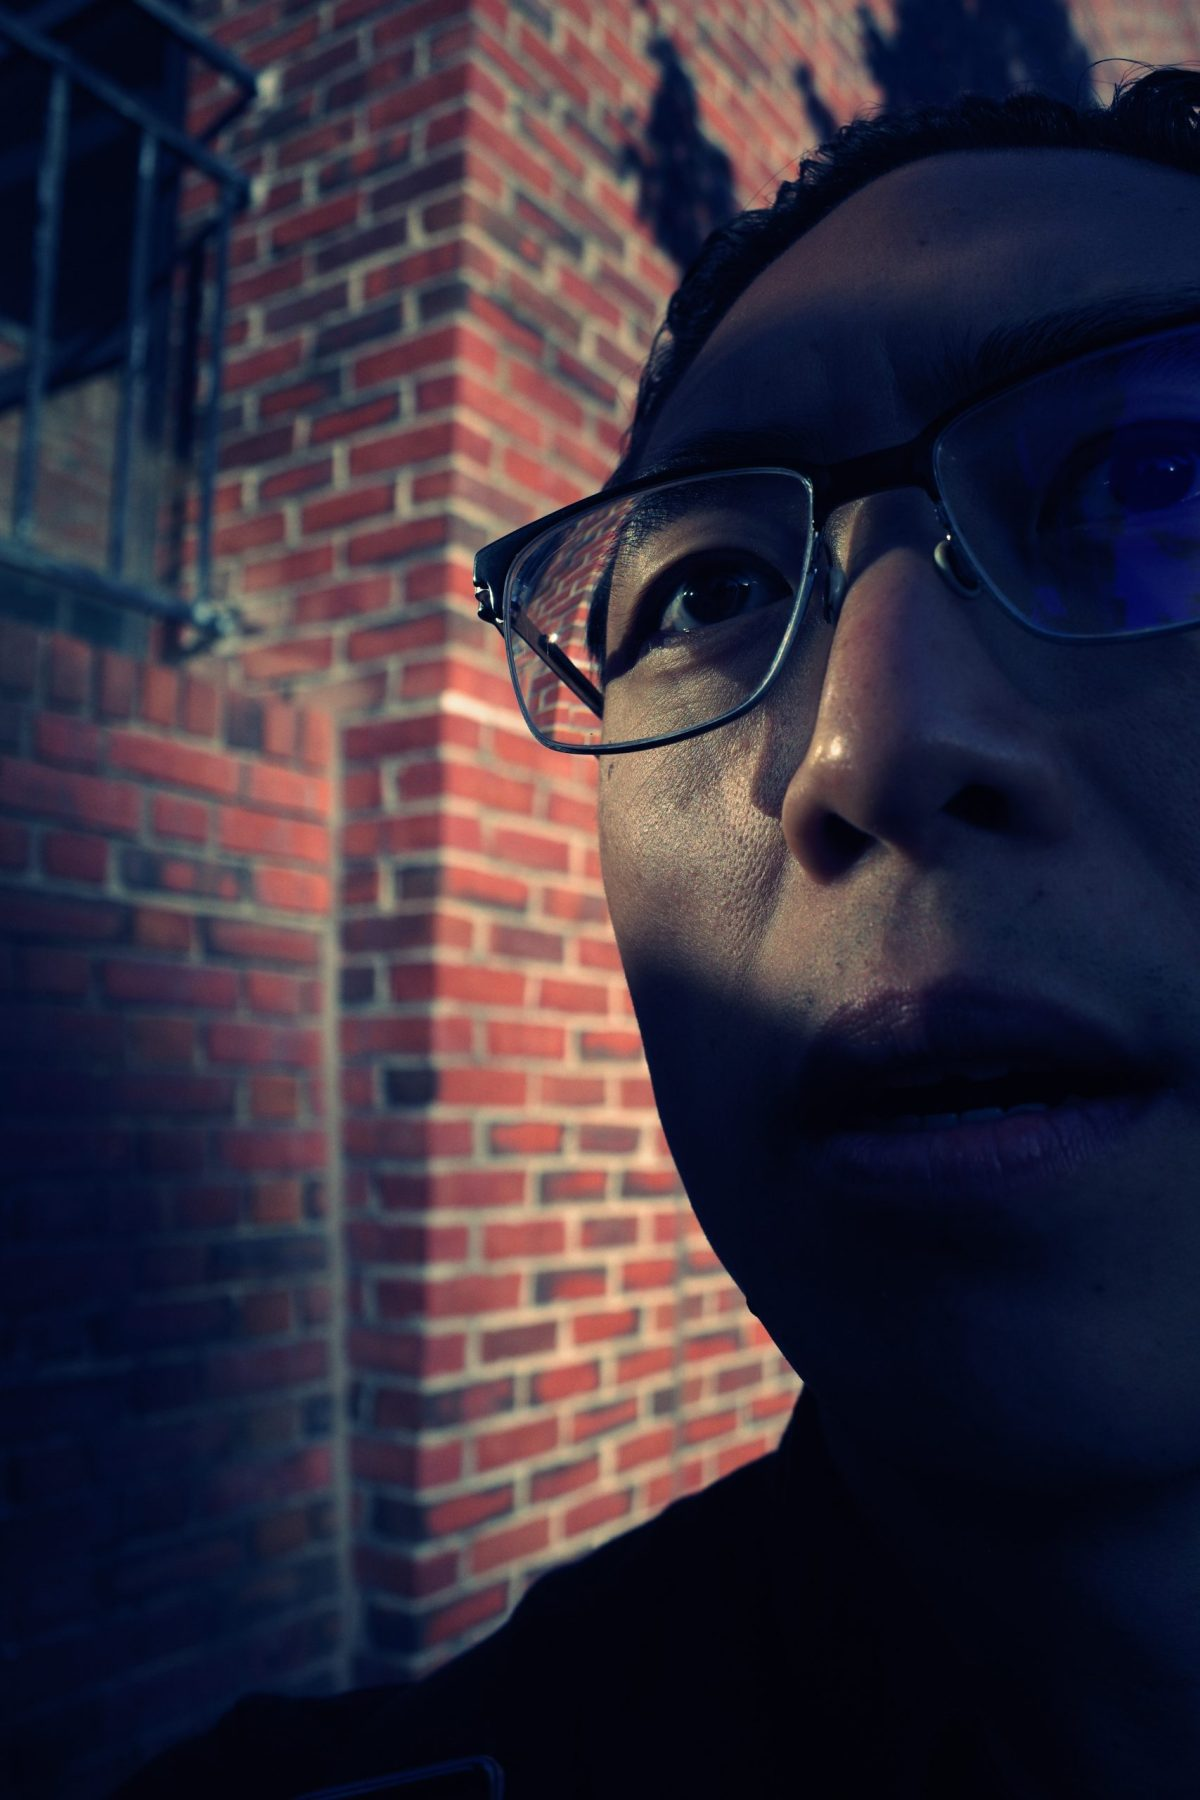 selfie Ricoh covid face mask